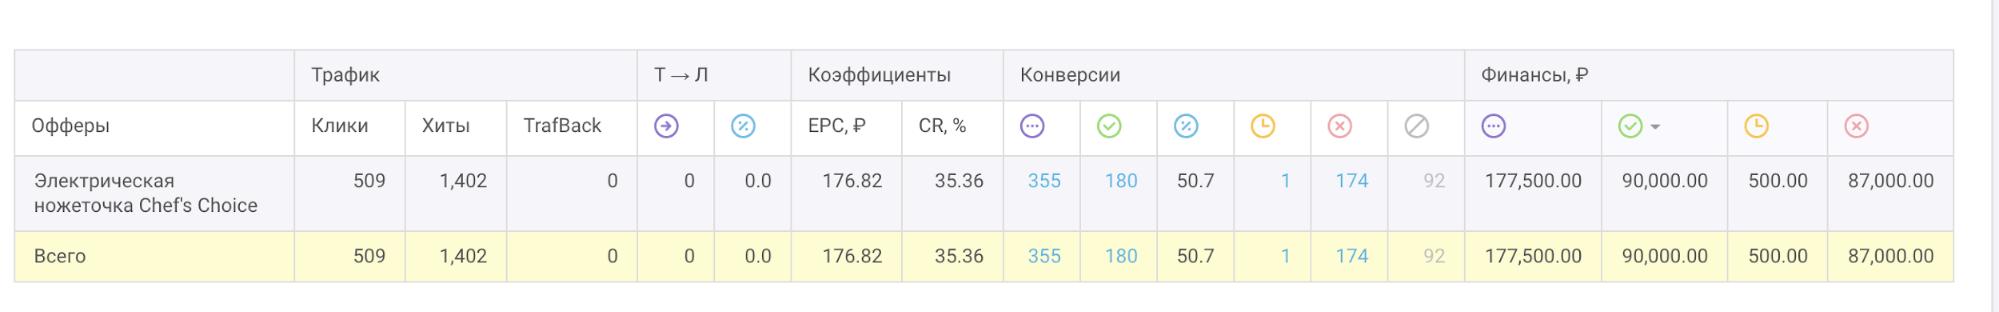 statistika-partnerka-png.2929